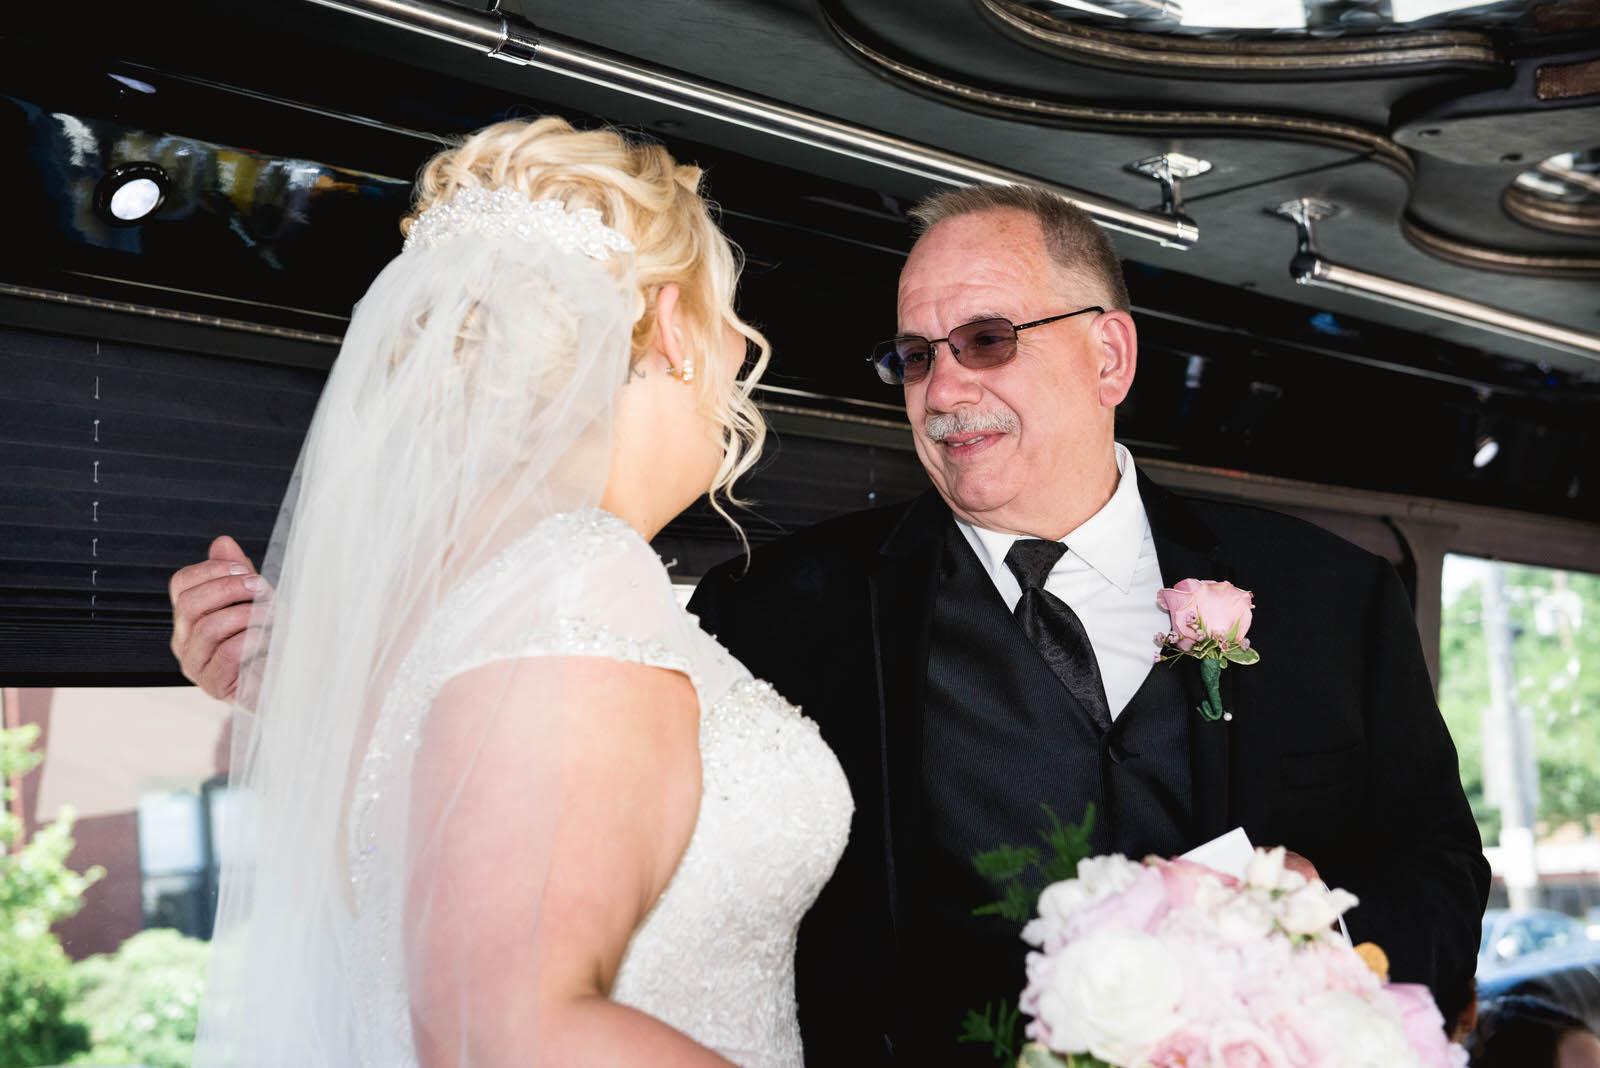 weddings-at-Holy-Cross-Greek-Orthodox-Church-and-Hall-13.jpg